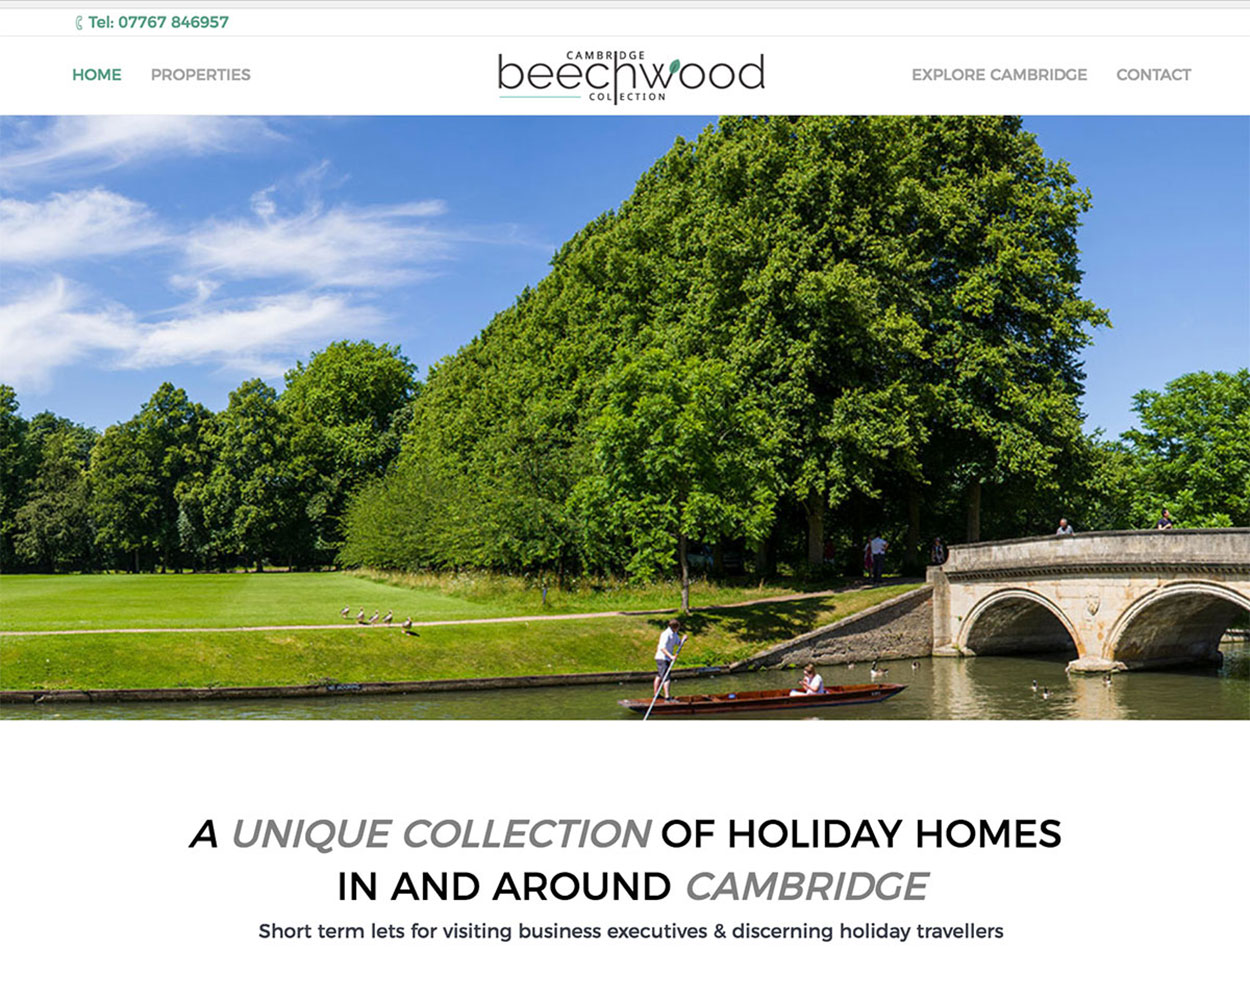 Beechwood Collection Website